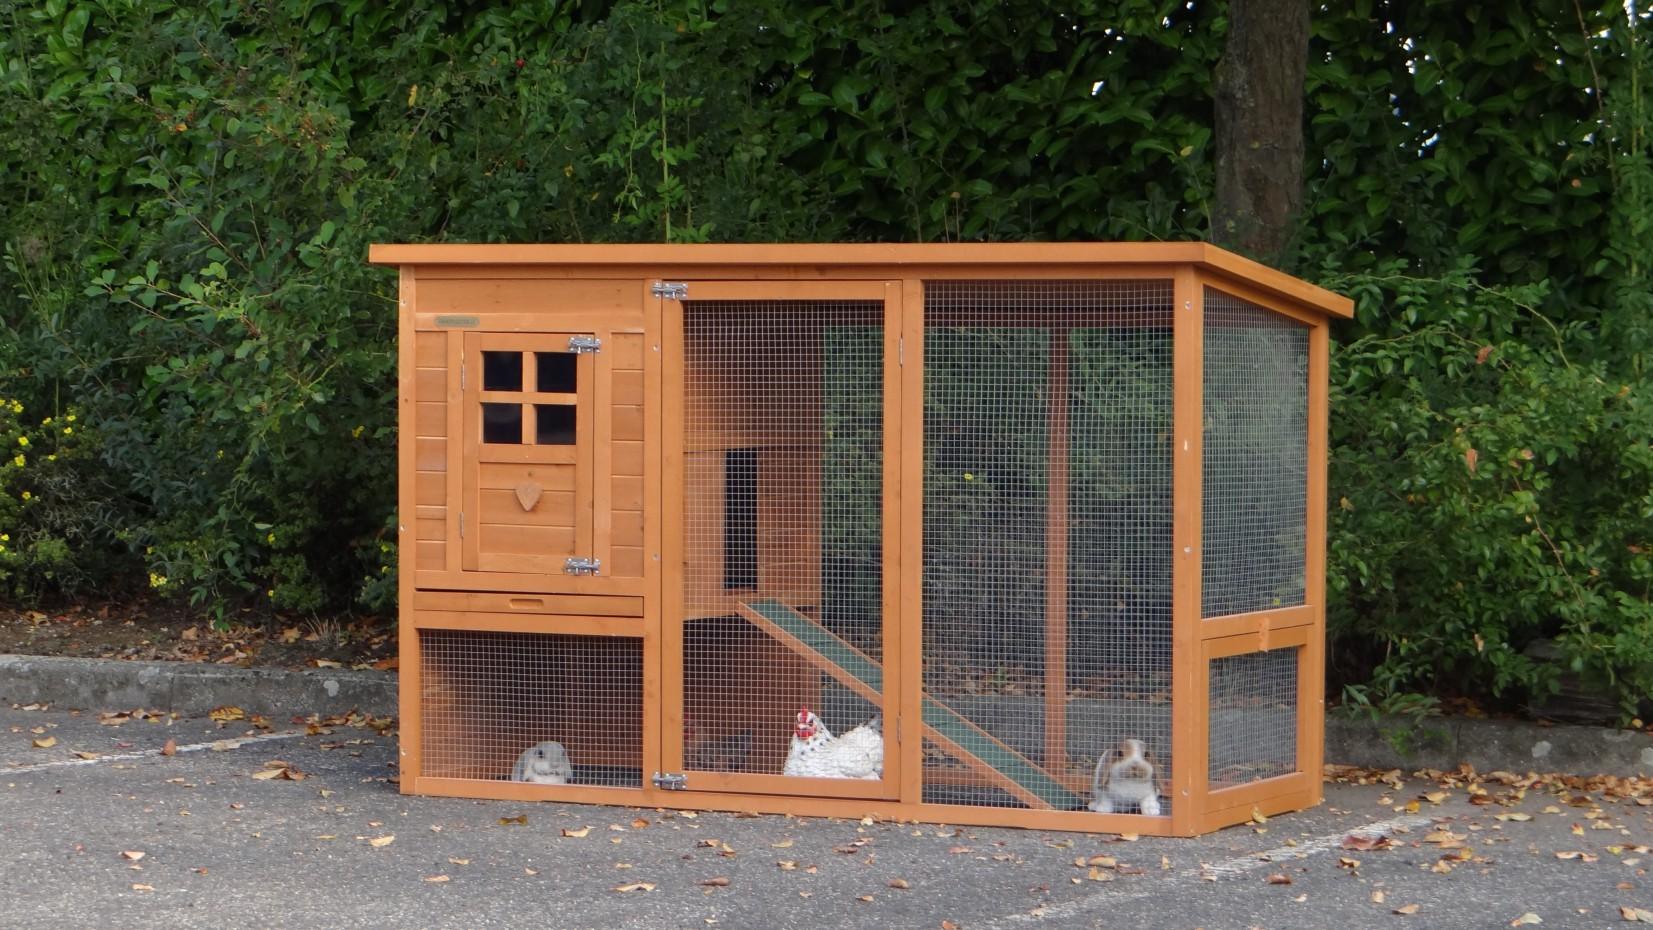 kaninchenstall julia 169x75x104cm. Black Bedroom Furniture Sets. Home Design Ideas